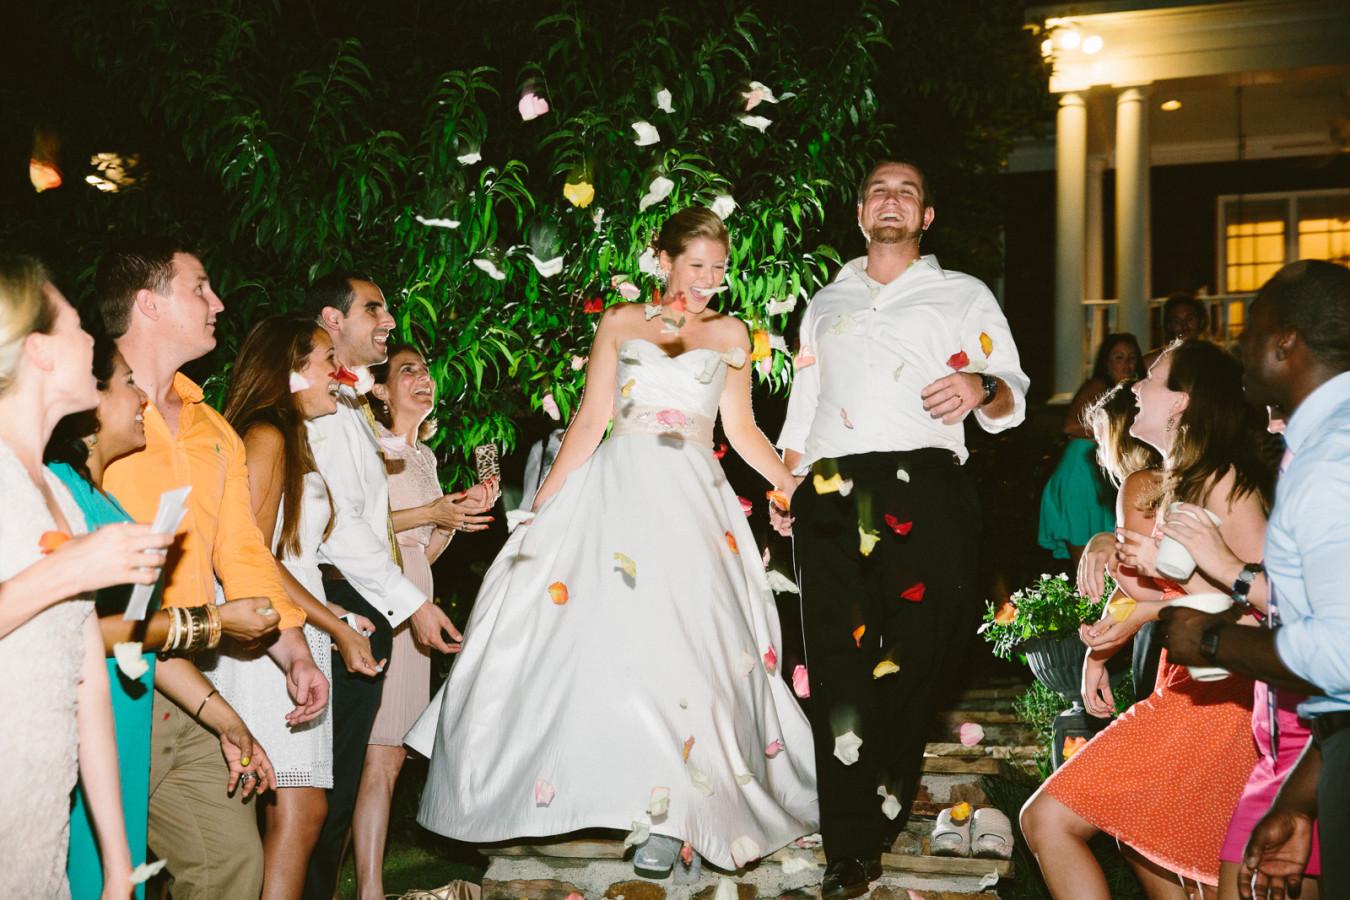 atlanta-wedding-photographer-exit-shot-rachel-noah-donnanphoto-00001